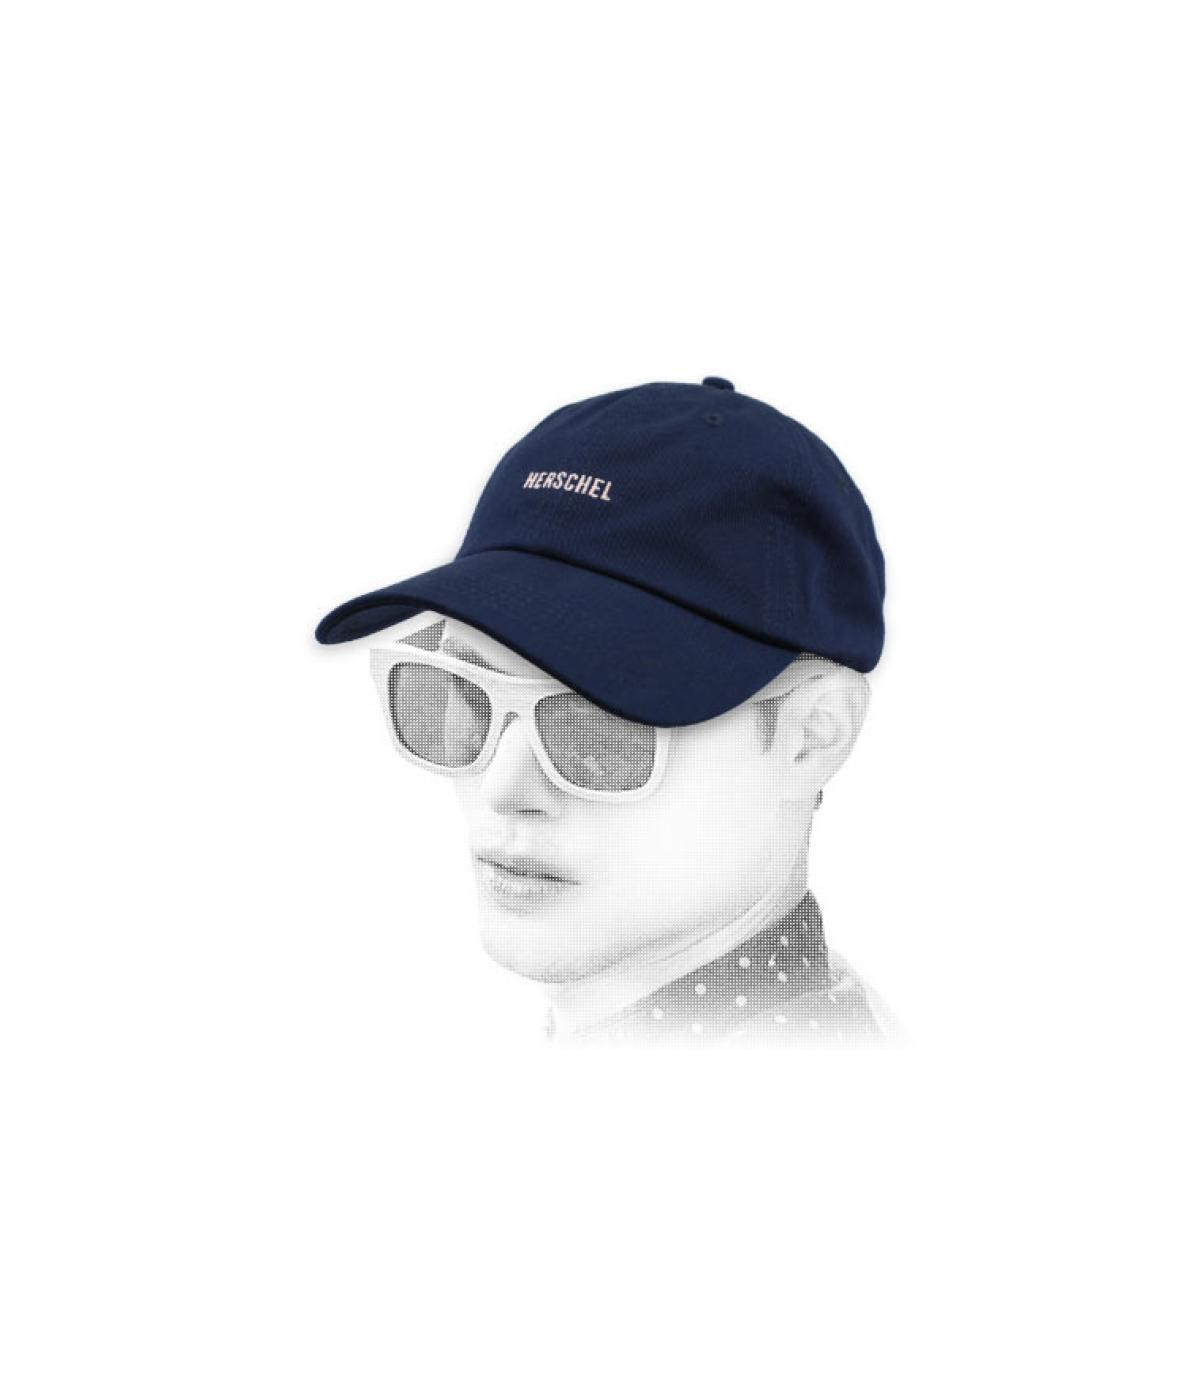 Cappellino della marina di Herschel